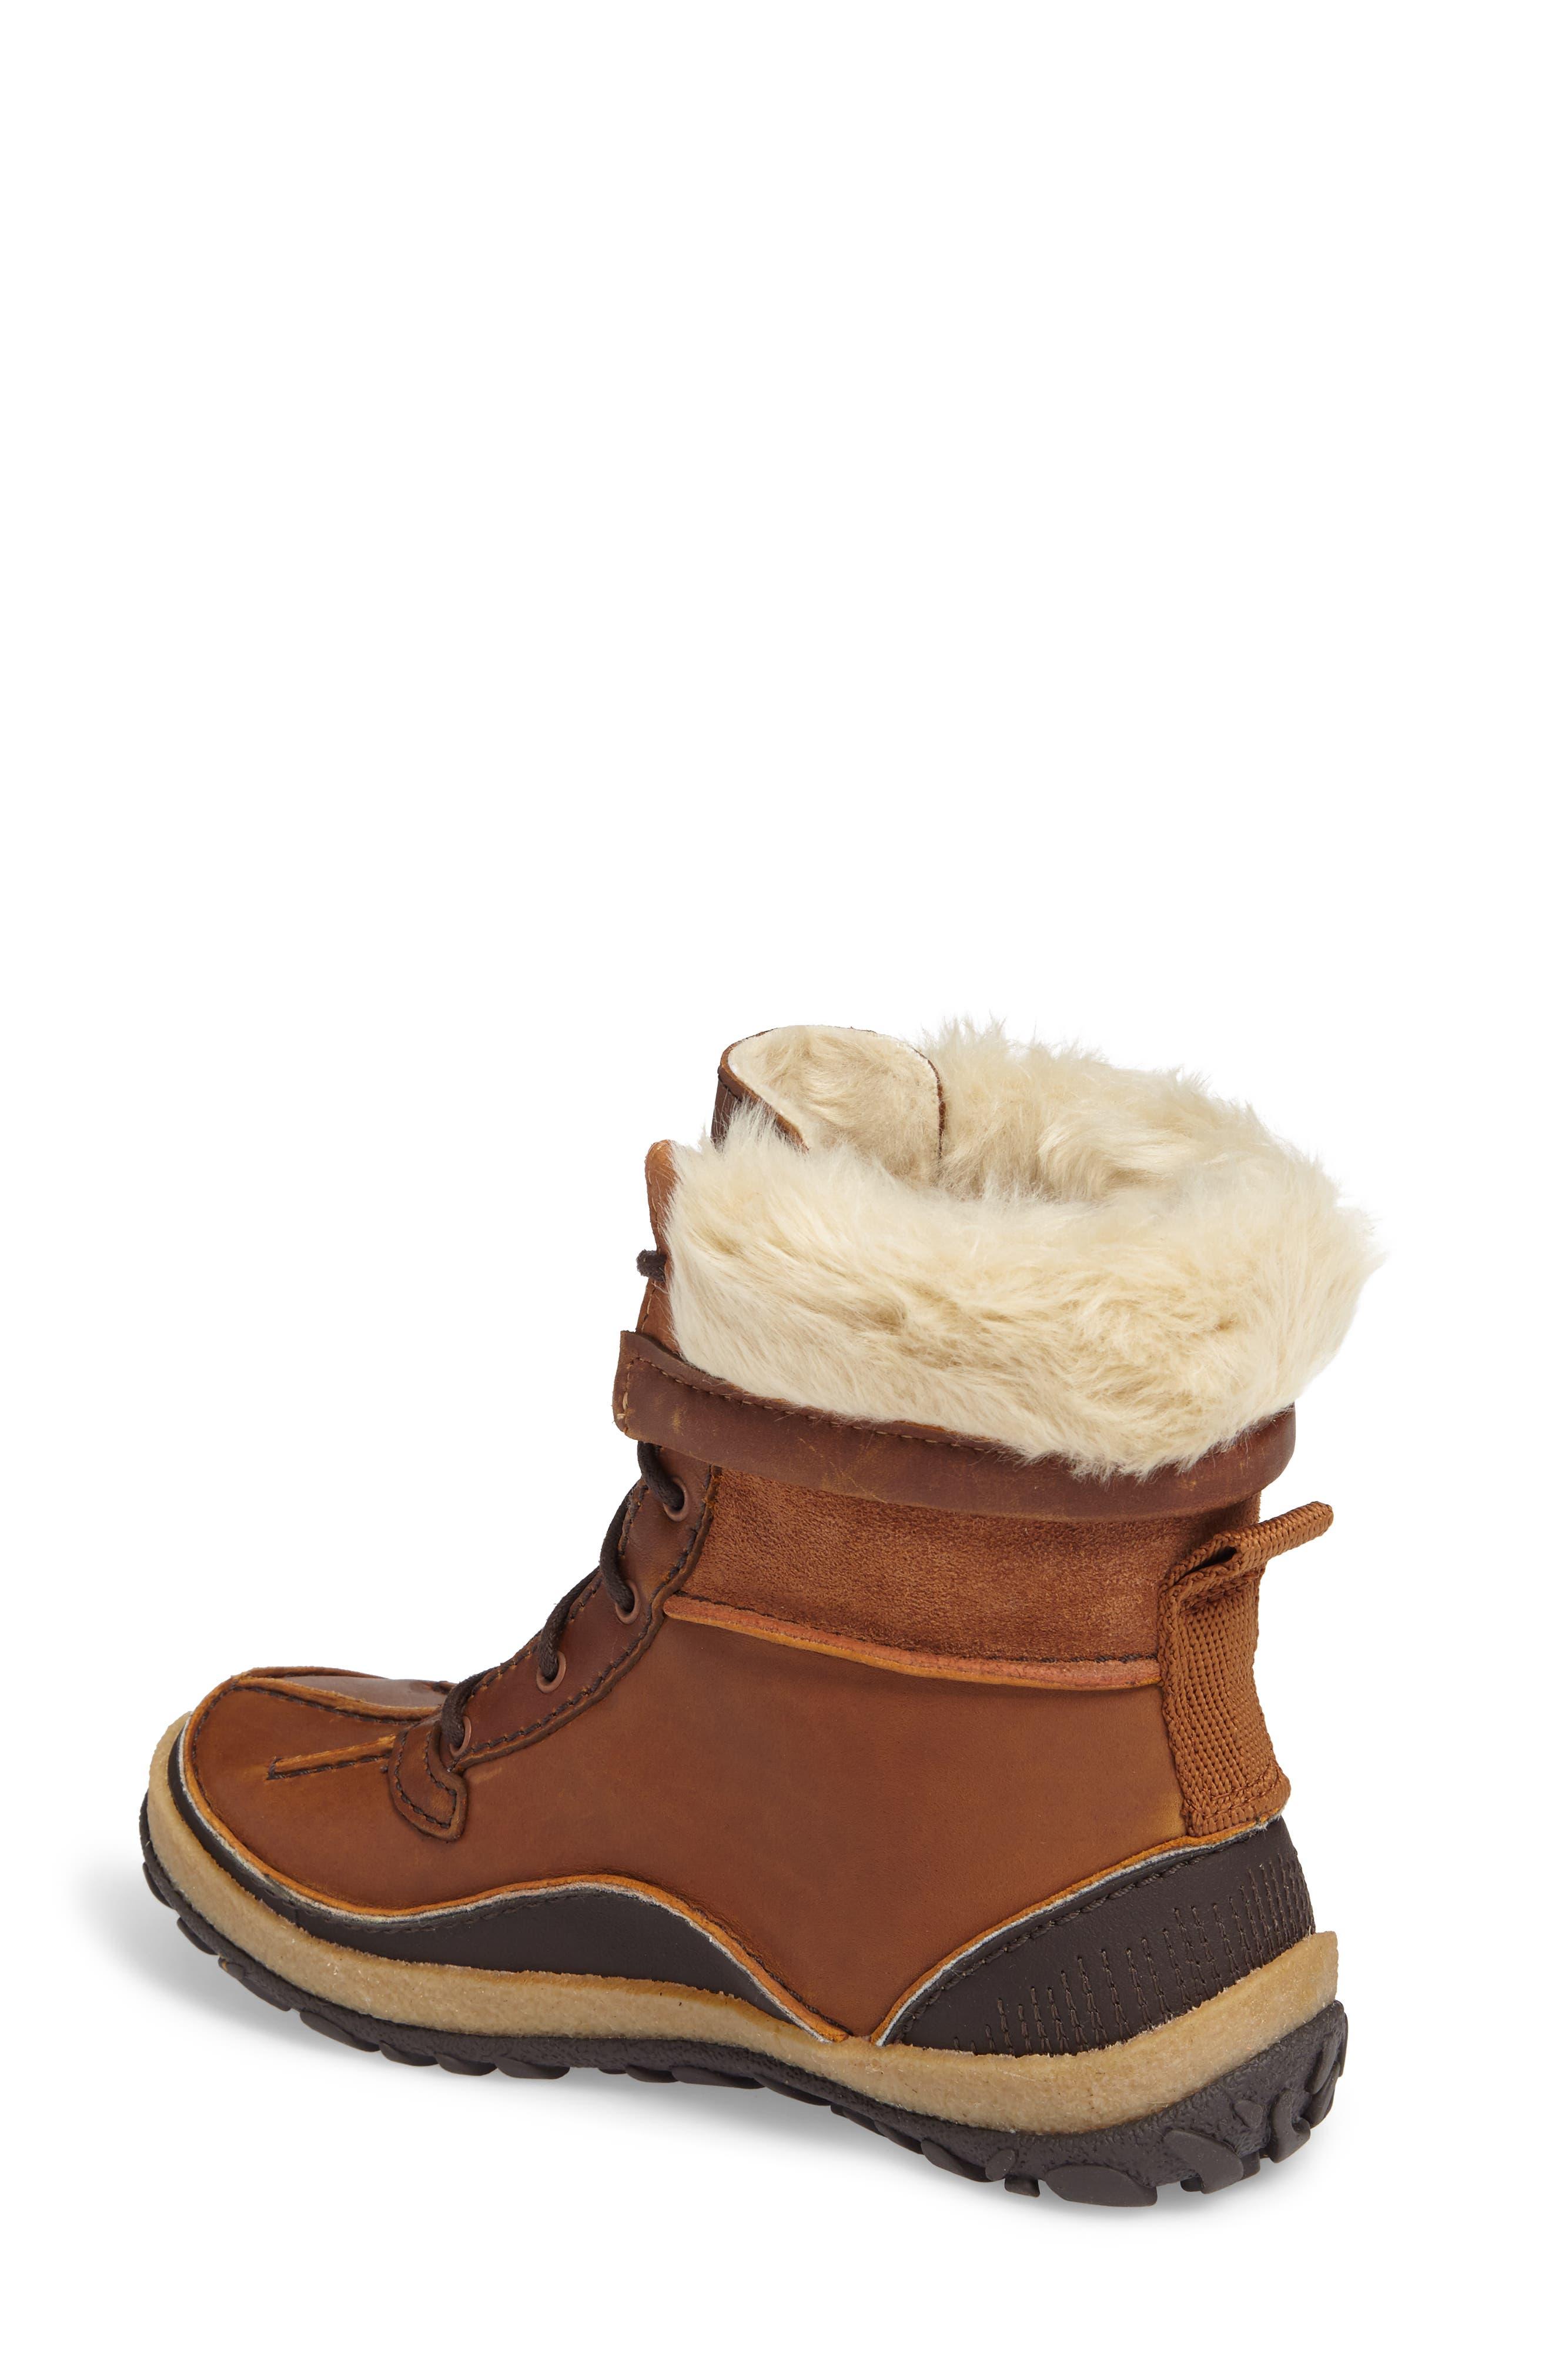 Alternate Image 2  - Merrell Tremblant Insulated Waterproof Boot (Women)